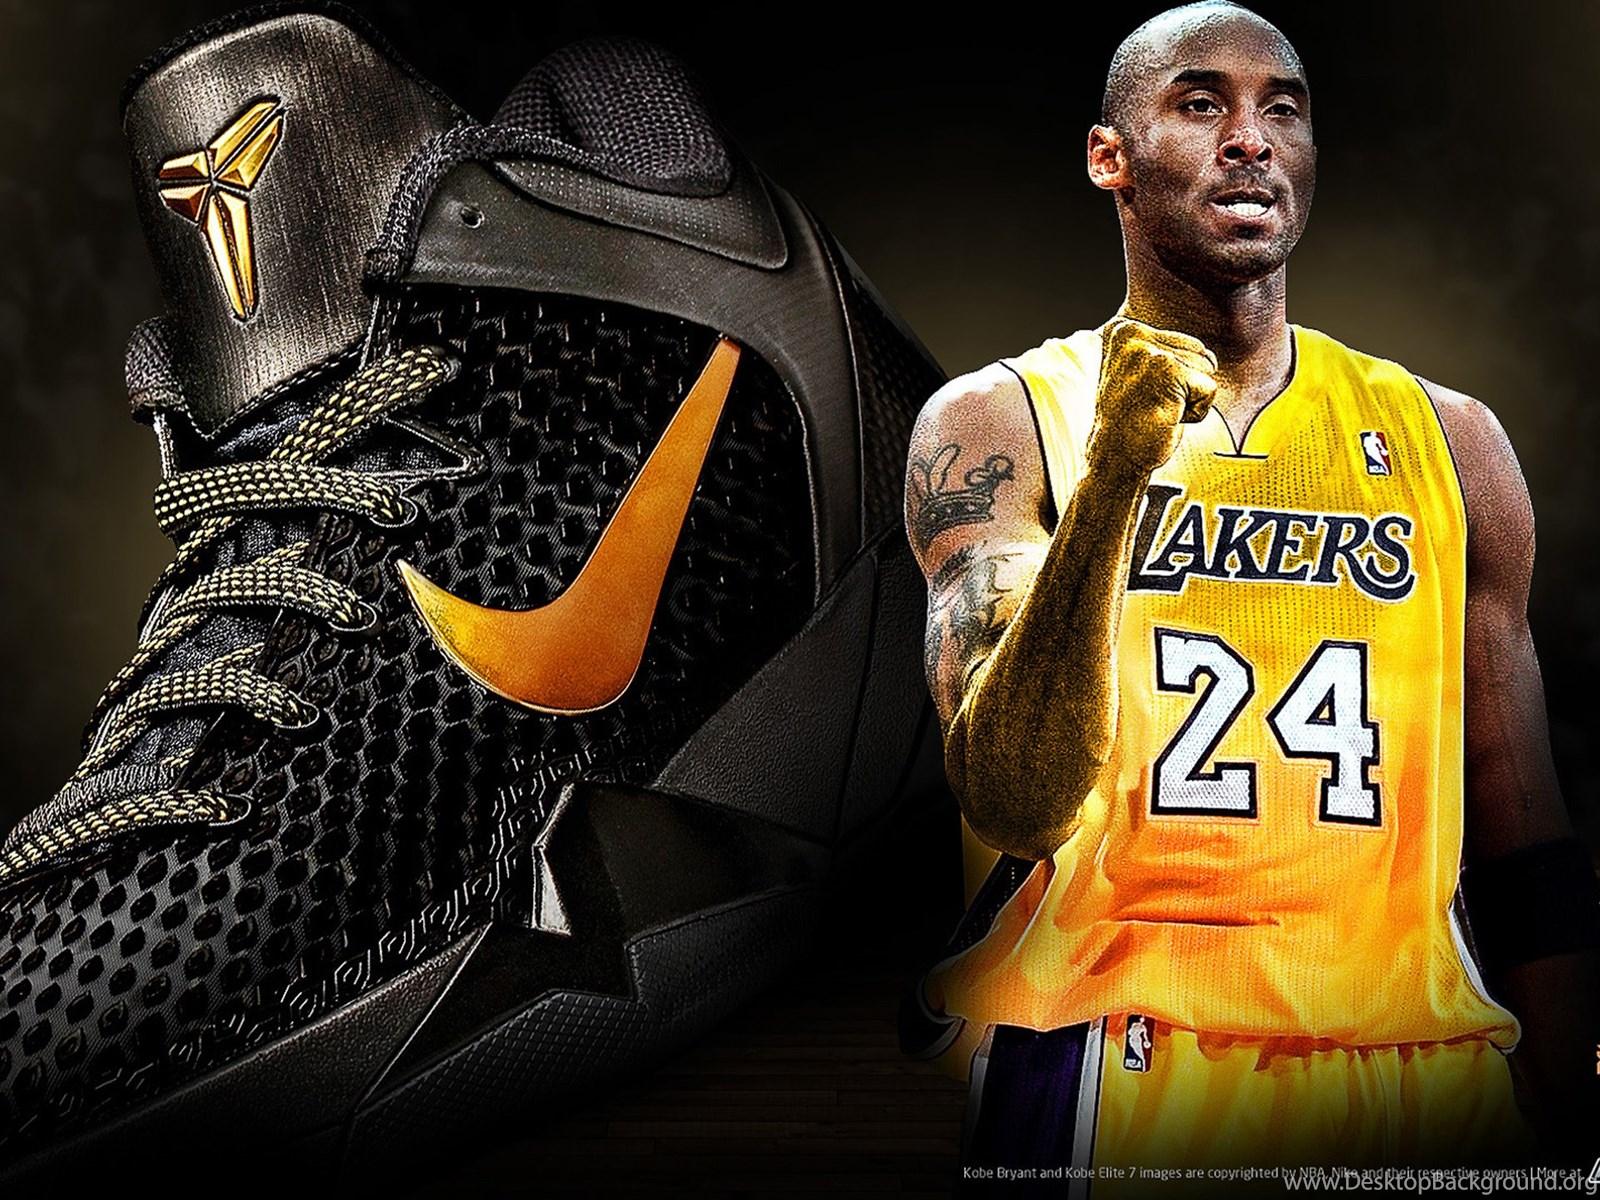 1056487_nike-basketball-shoes-wallpapers-hd-14-hd-desktop-wallpapers_2560x1440_h.jpg